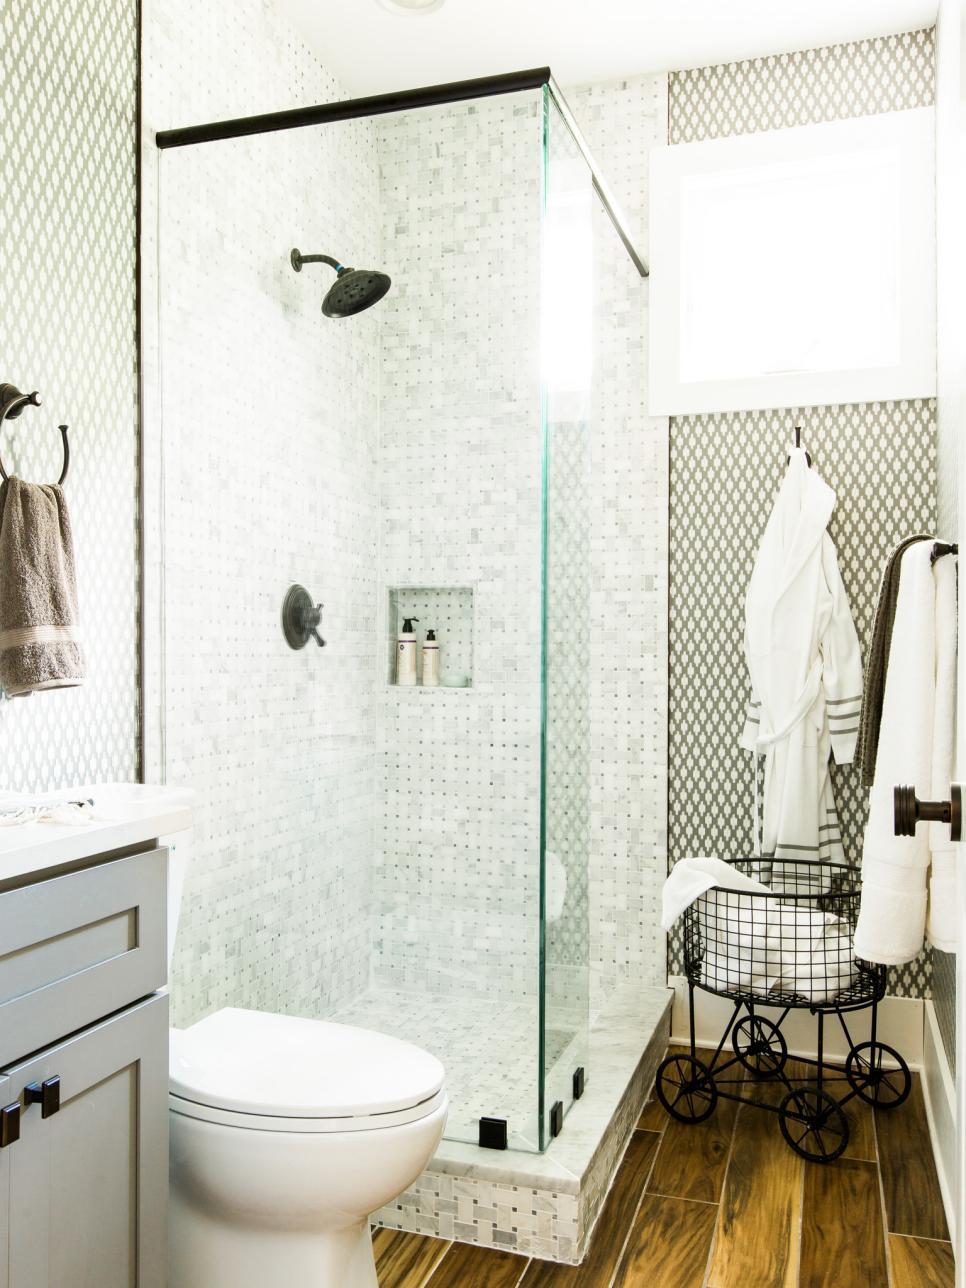 hgtv_2017_guest-bathroom-16-shower_v-jpg-rend-hgtvcom-966-1288